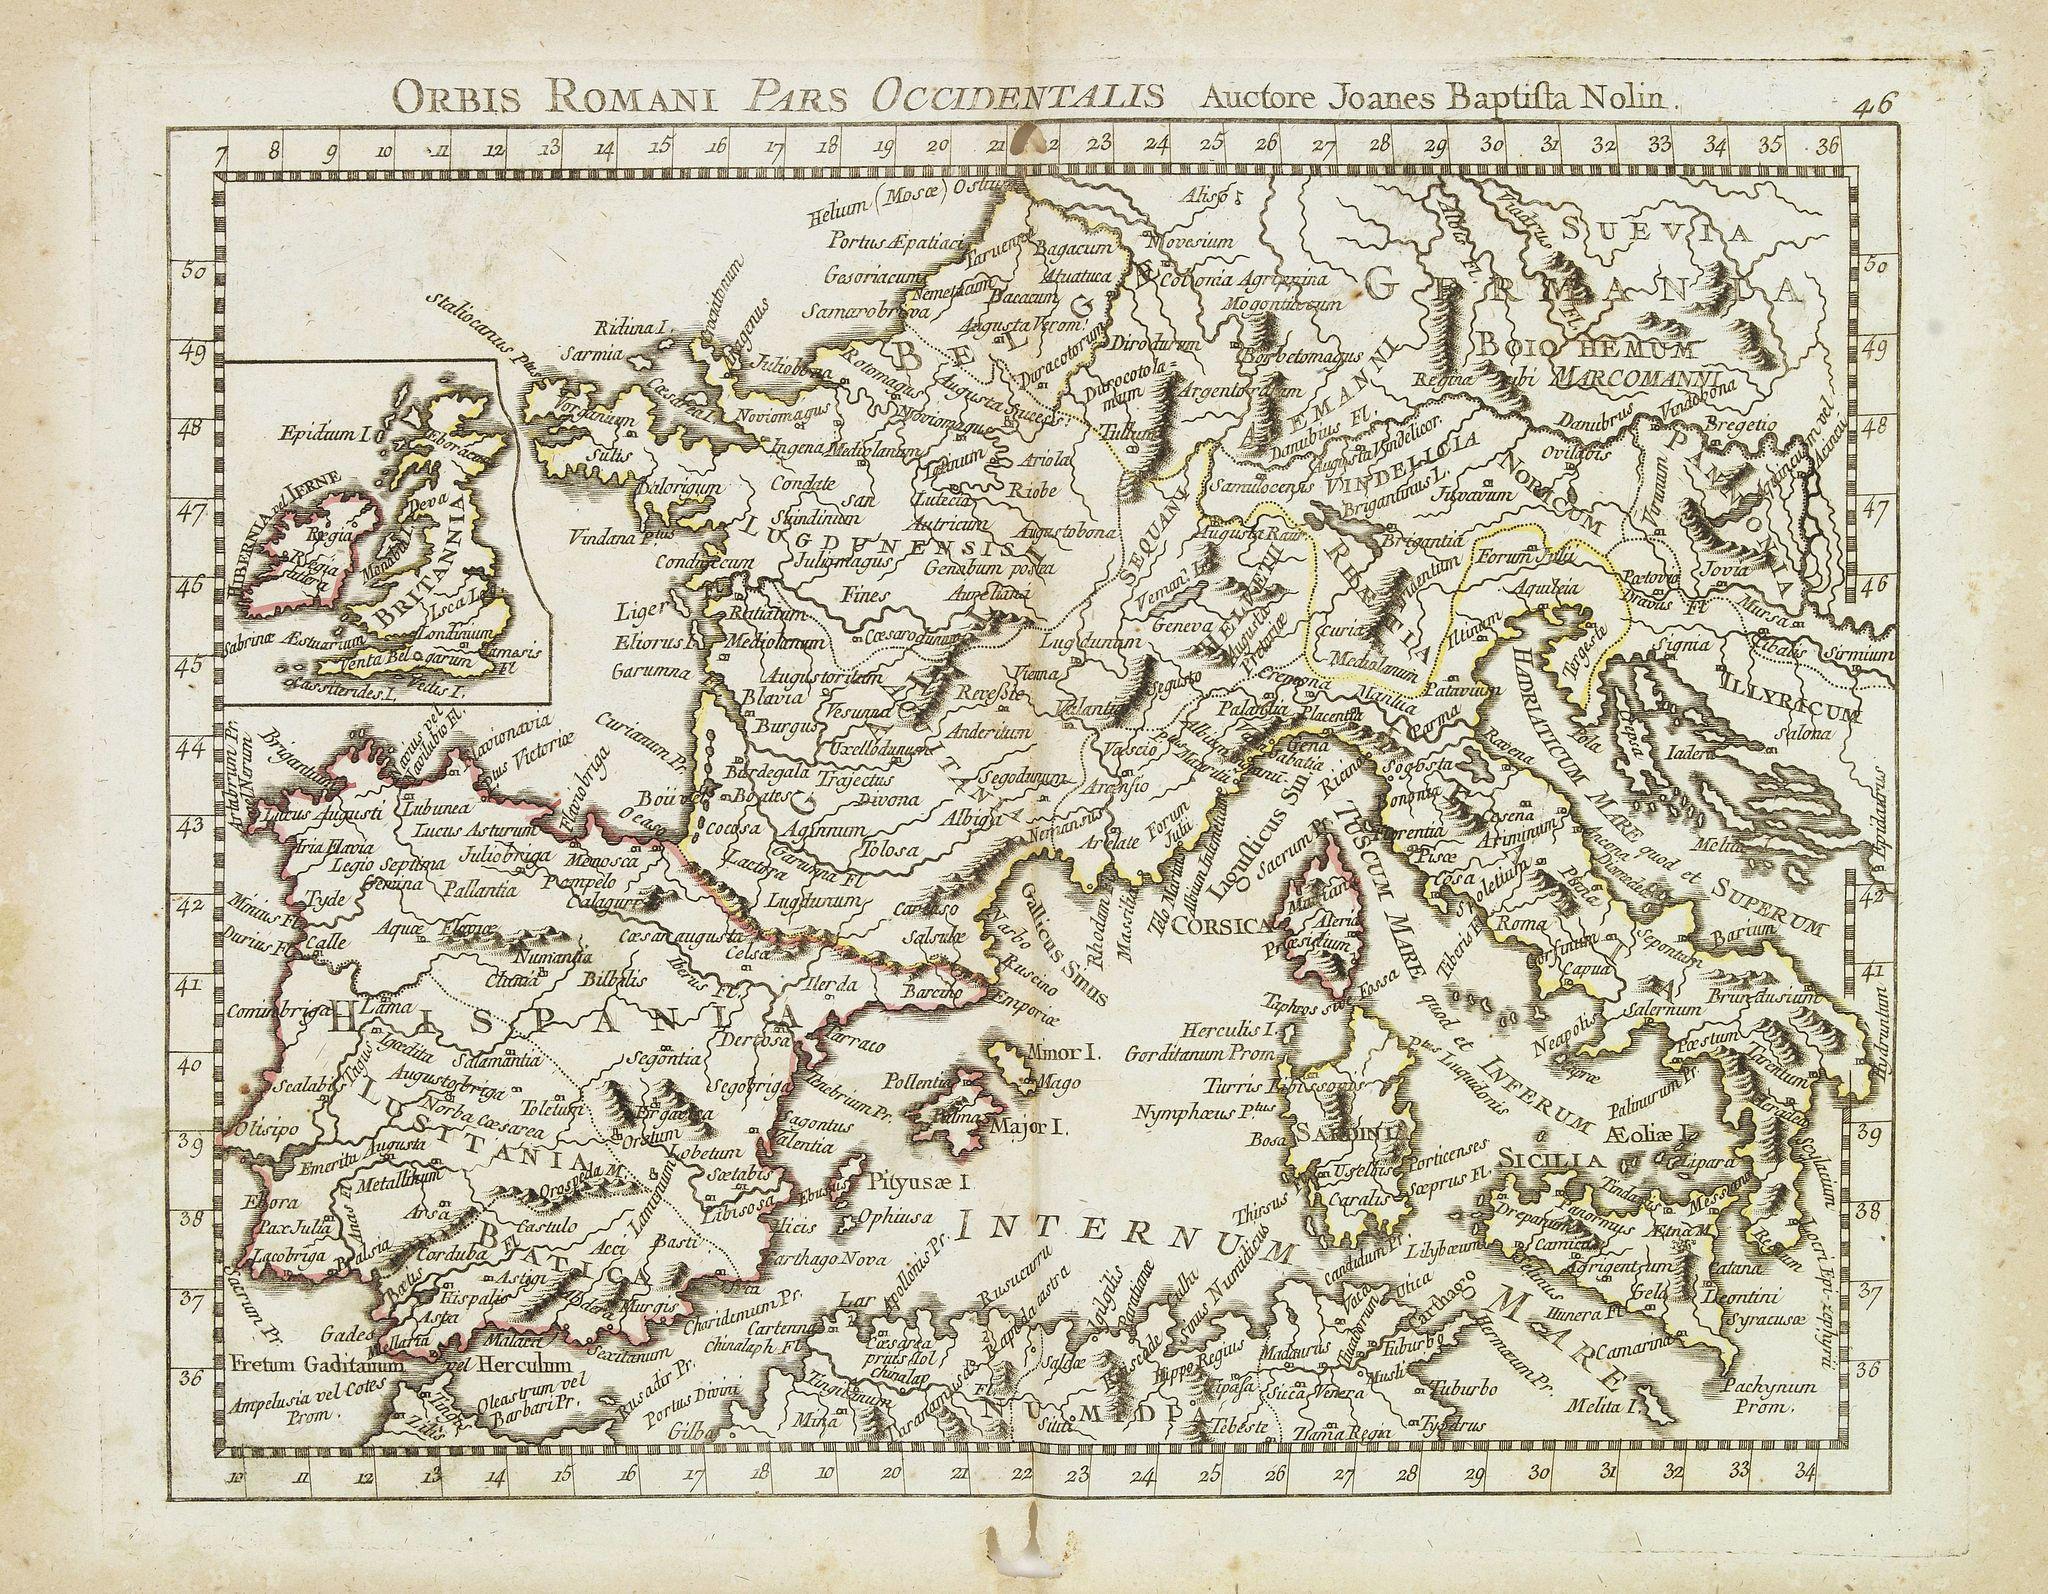 MONDHARE, L.J. / NOLIN, J.B. -  Orbis Romani Pars Ocidentalis. . .